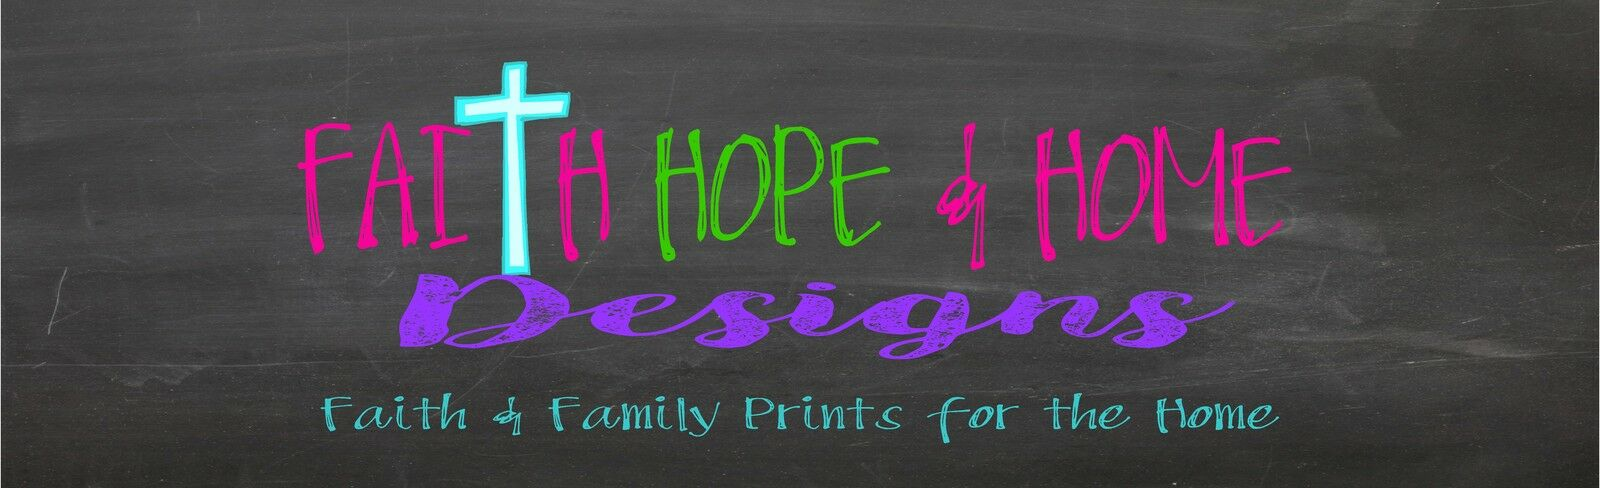 FaithHope&HomeDesigns